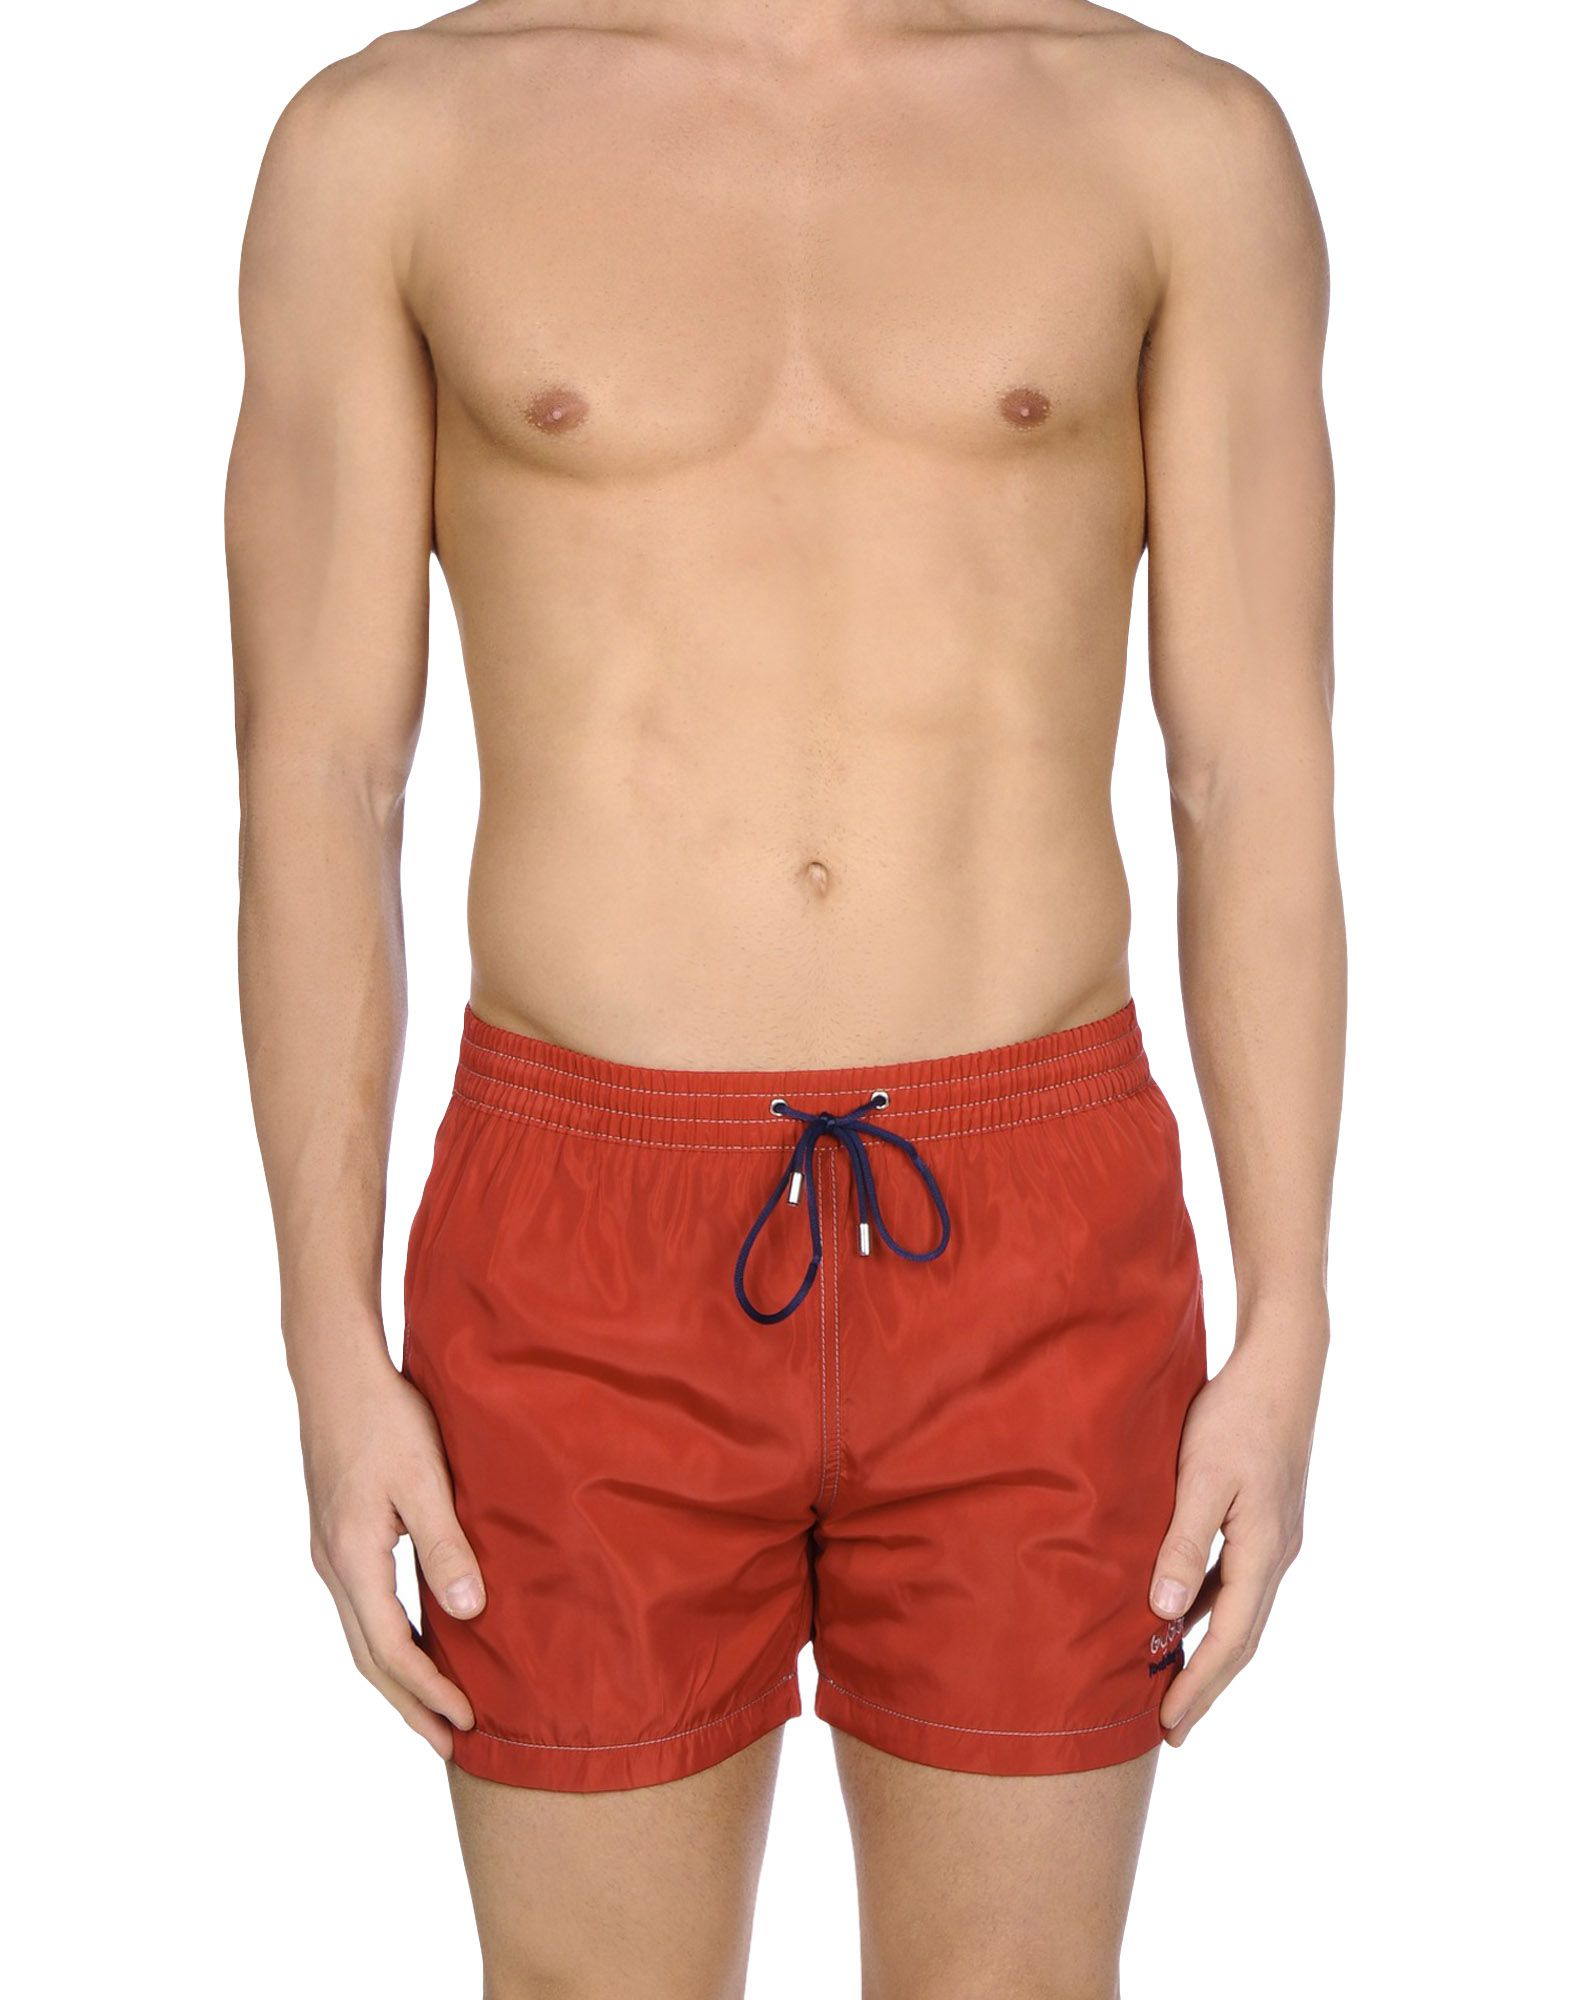 BYBLOS BEACHWEAR Шорты для плавания шорты для девочки bj8770l разноцветный byblos